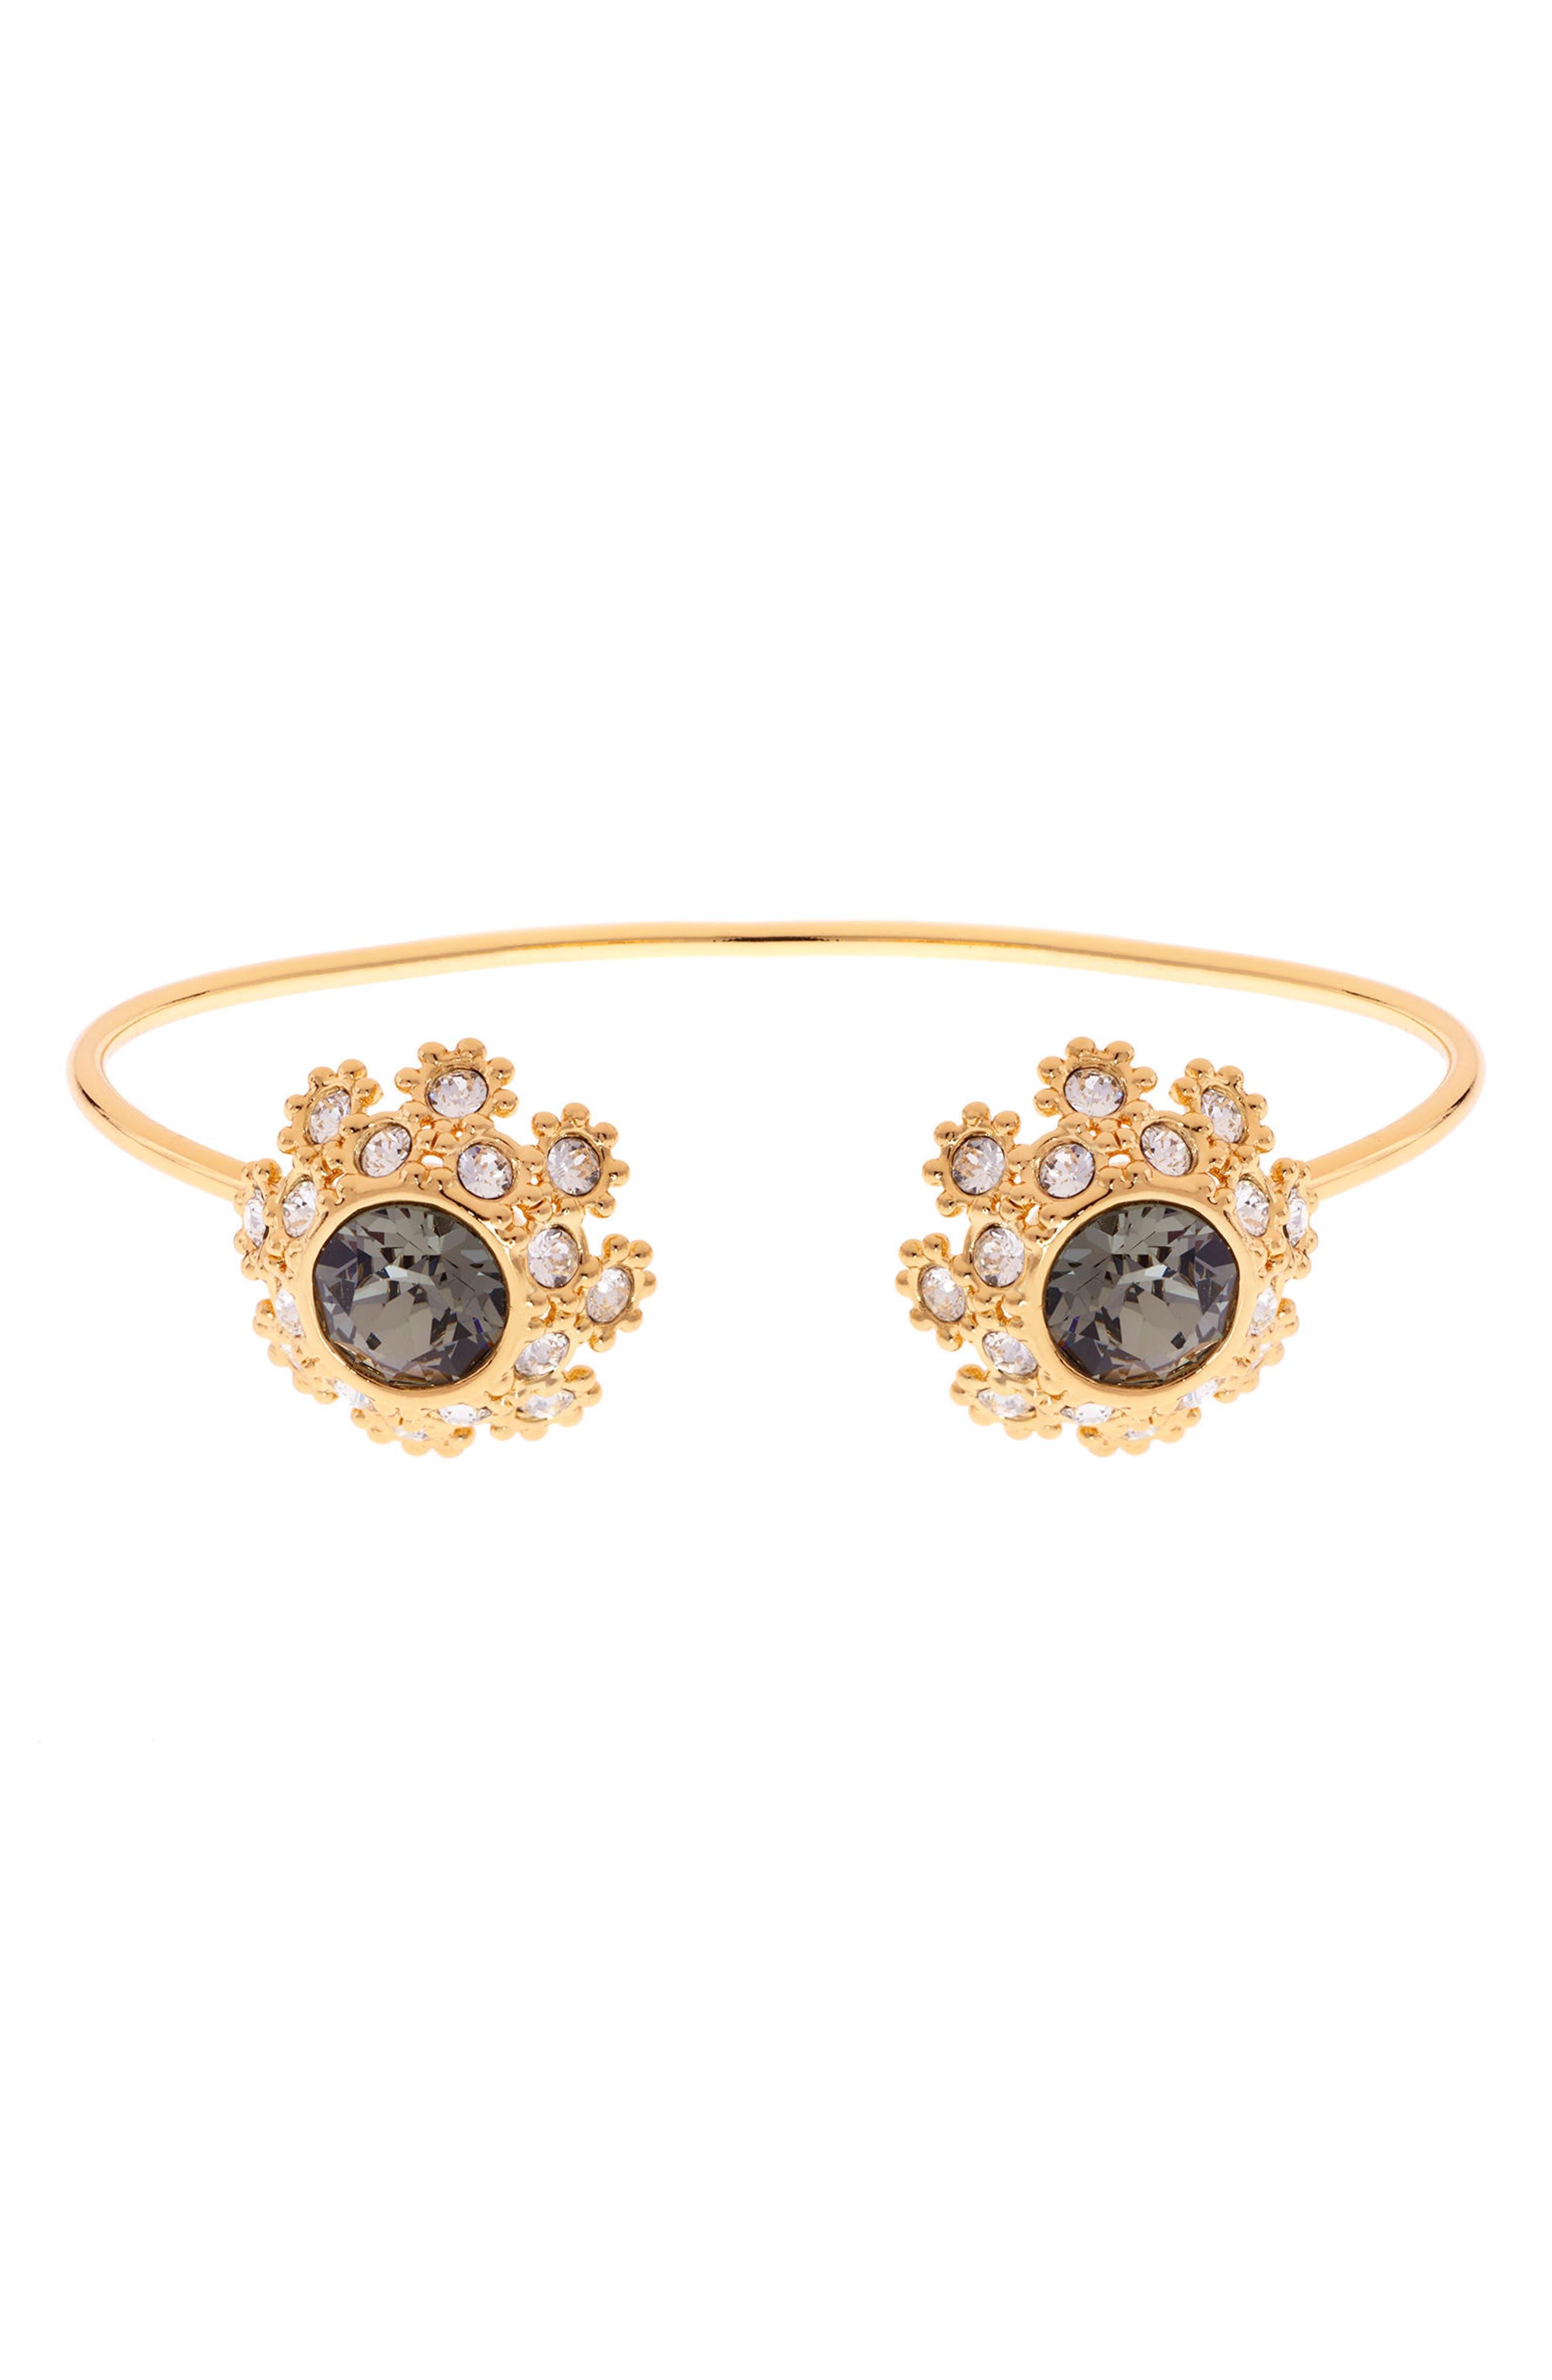 Crystal Daisy Lace Cuff Bracelet,                             Main thumbnail 1, color,                             009